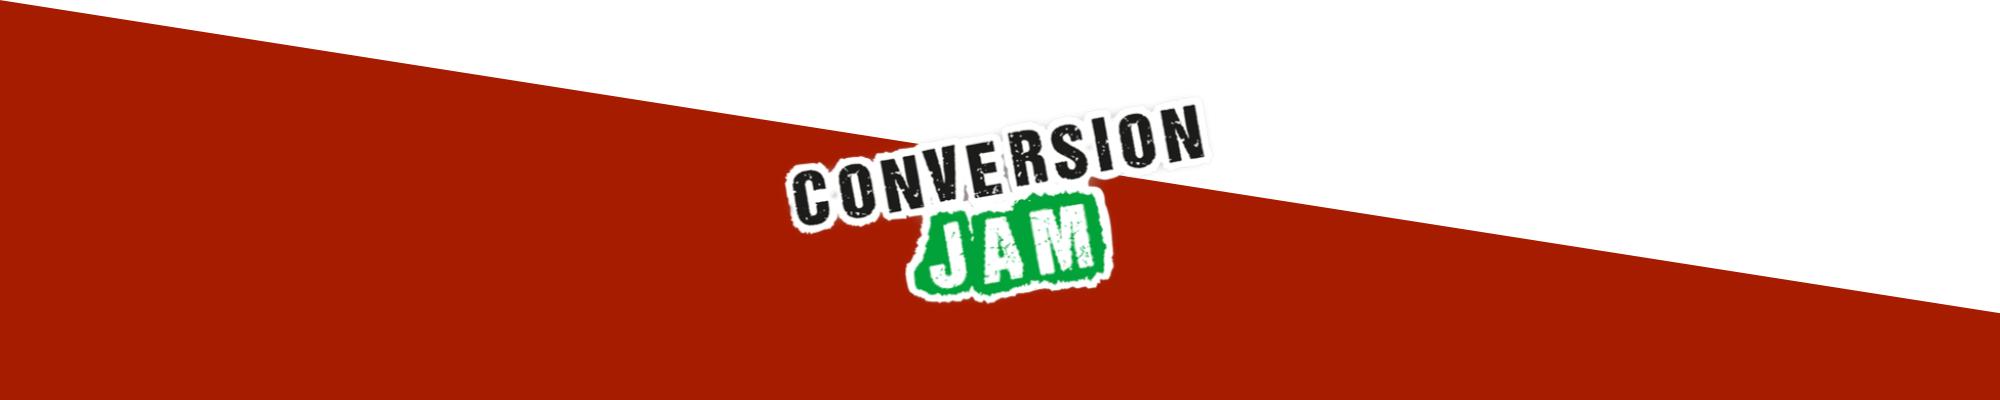 Conversion Jam, arrangerat av Conversionista!